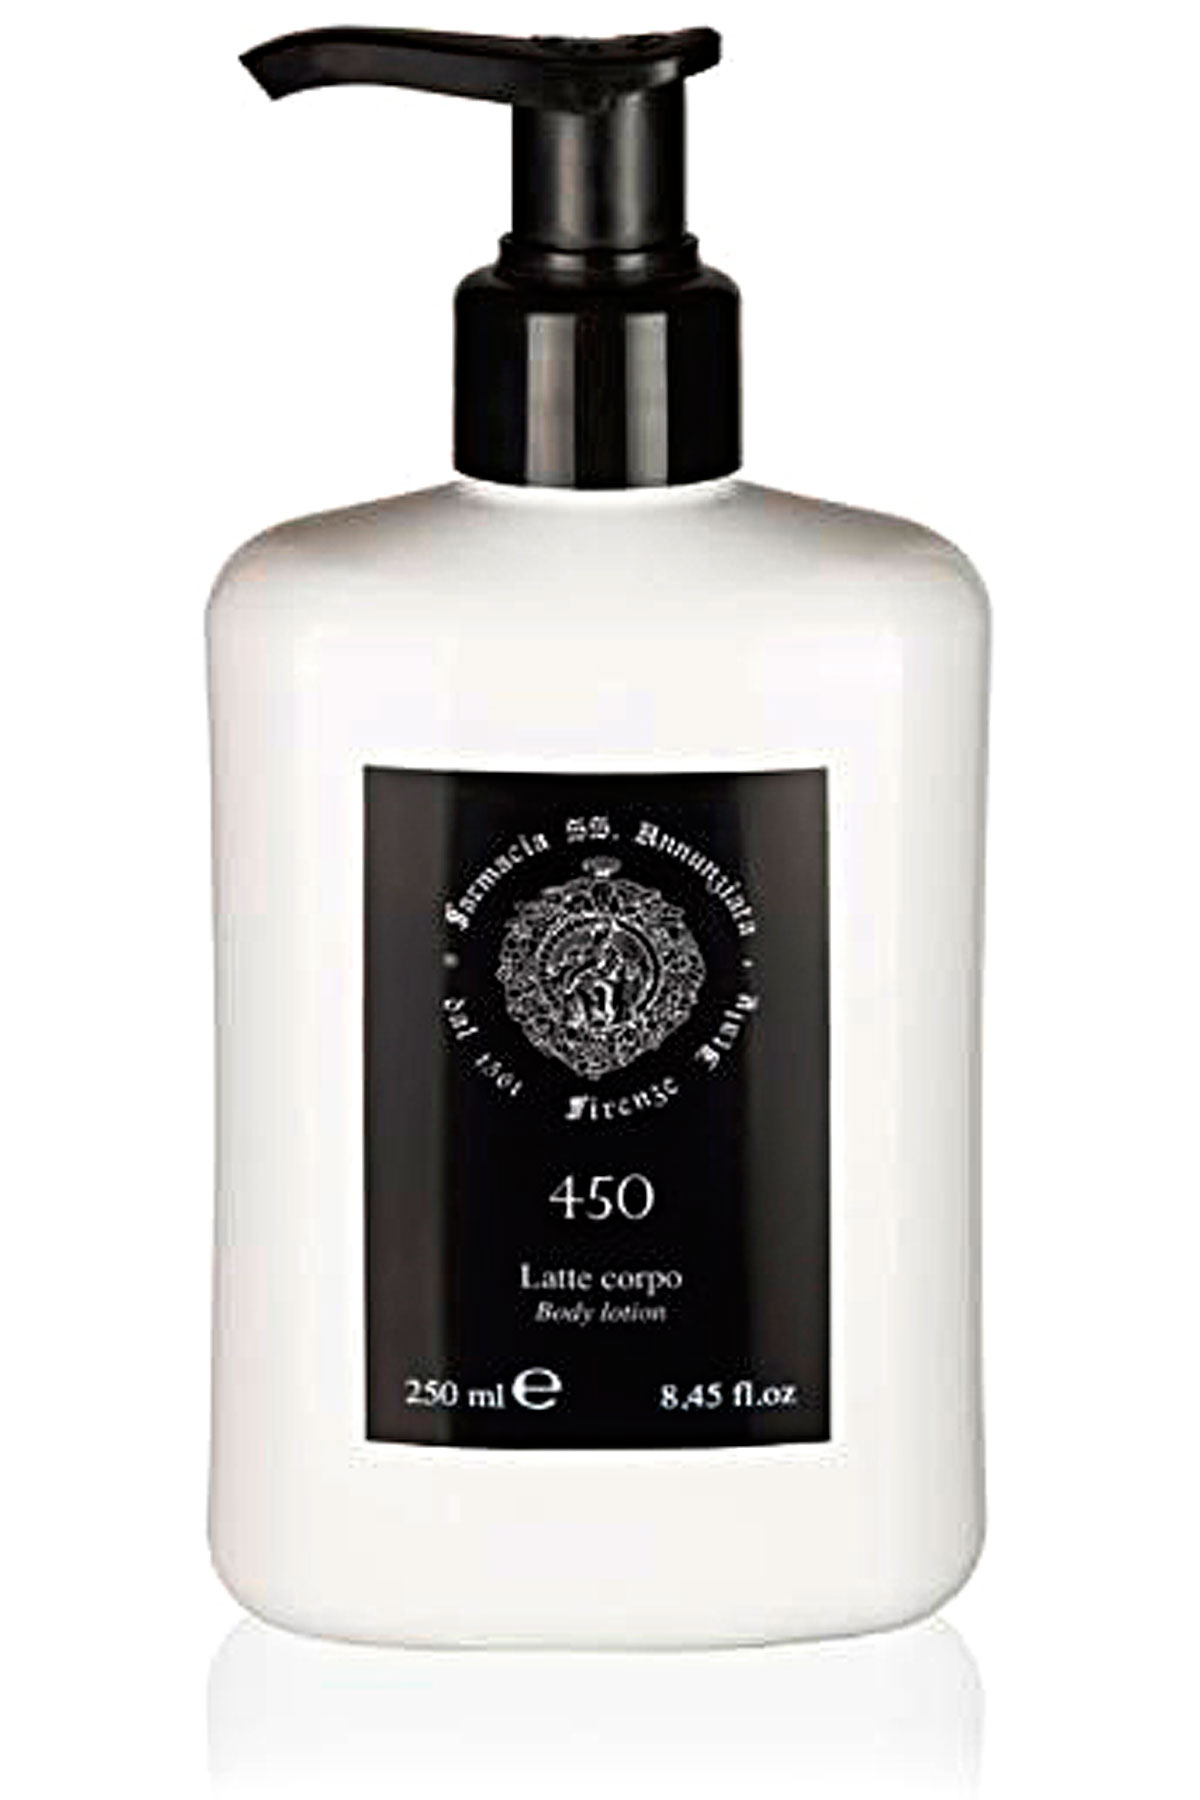 Farmacia Ss Annunziata 1561 Beauty for Women On Sale, 450 - Body Milk - 250 Ml, 2019, 250 ml